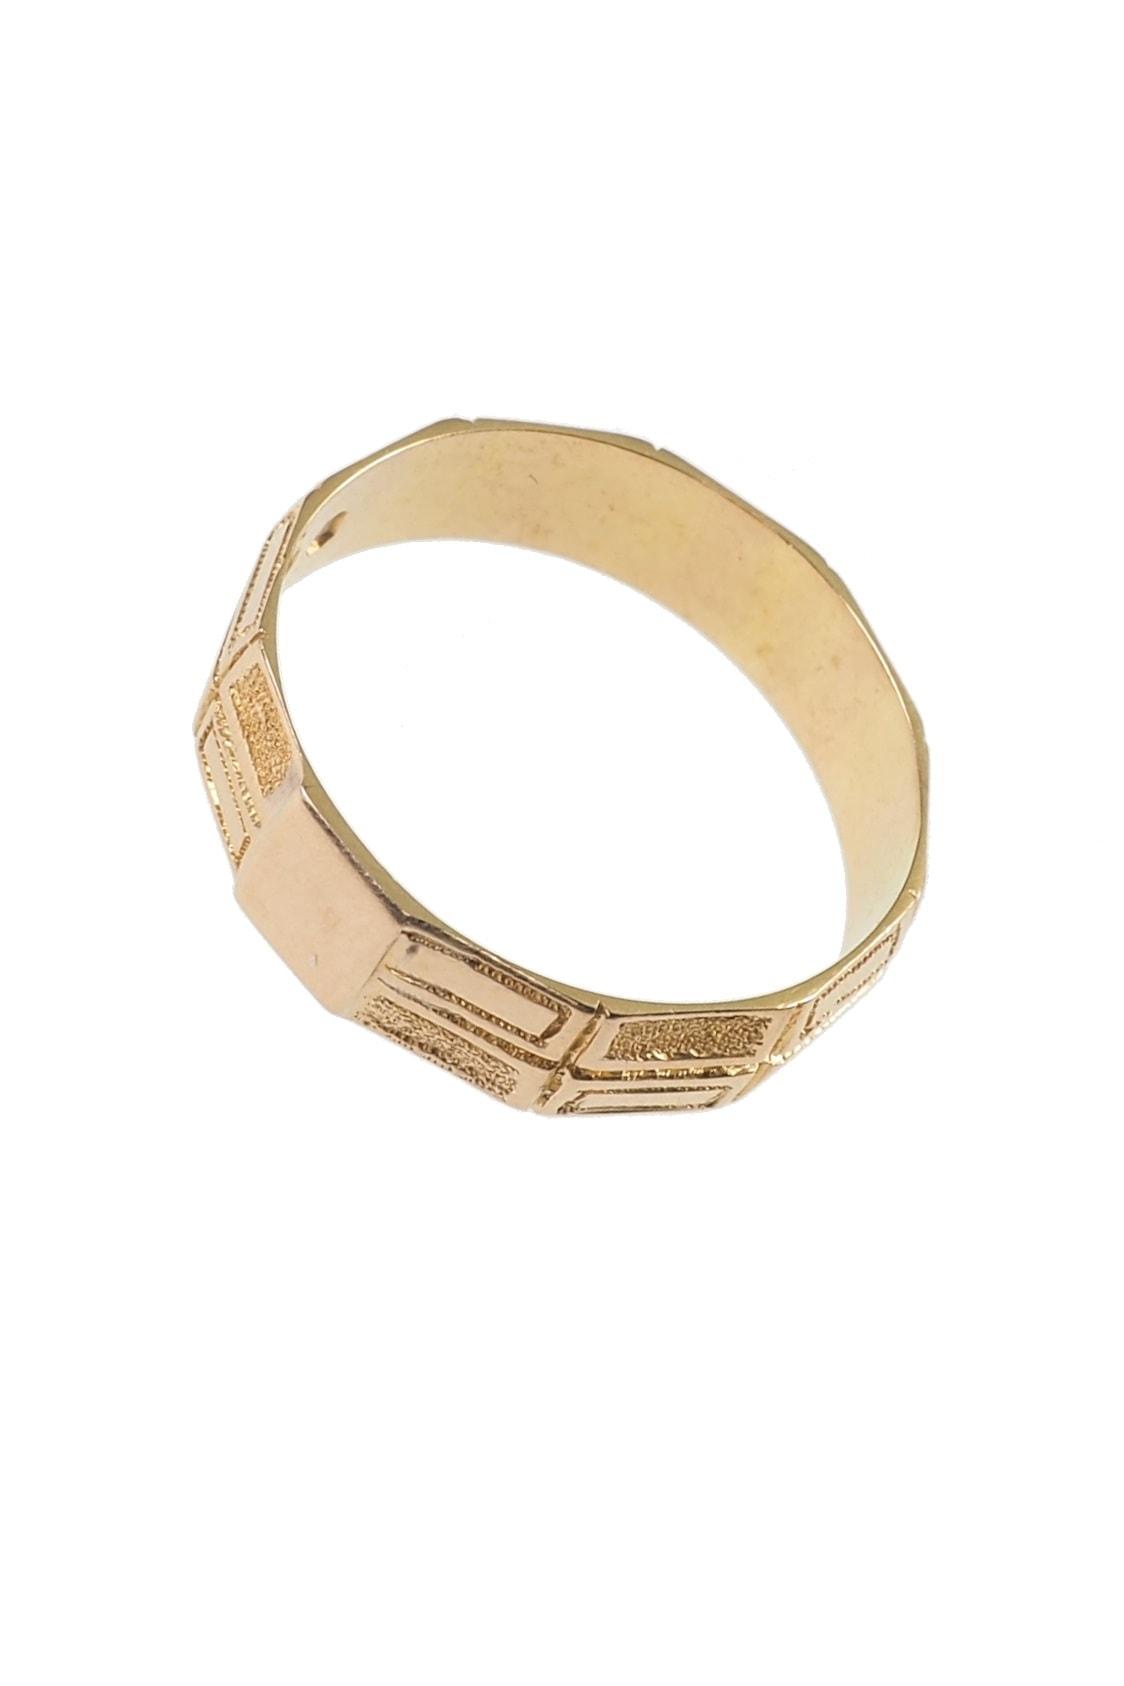 antike-Goldeheringe-kaufen-2290b